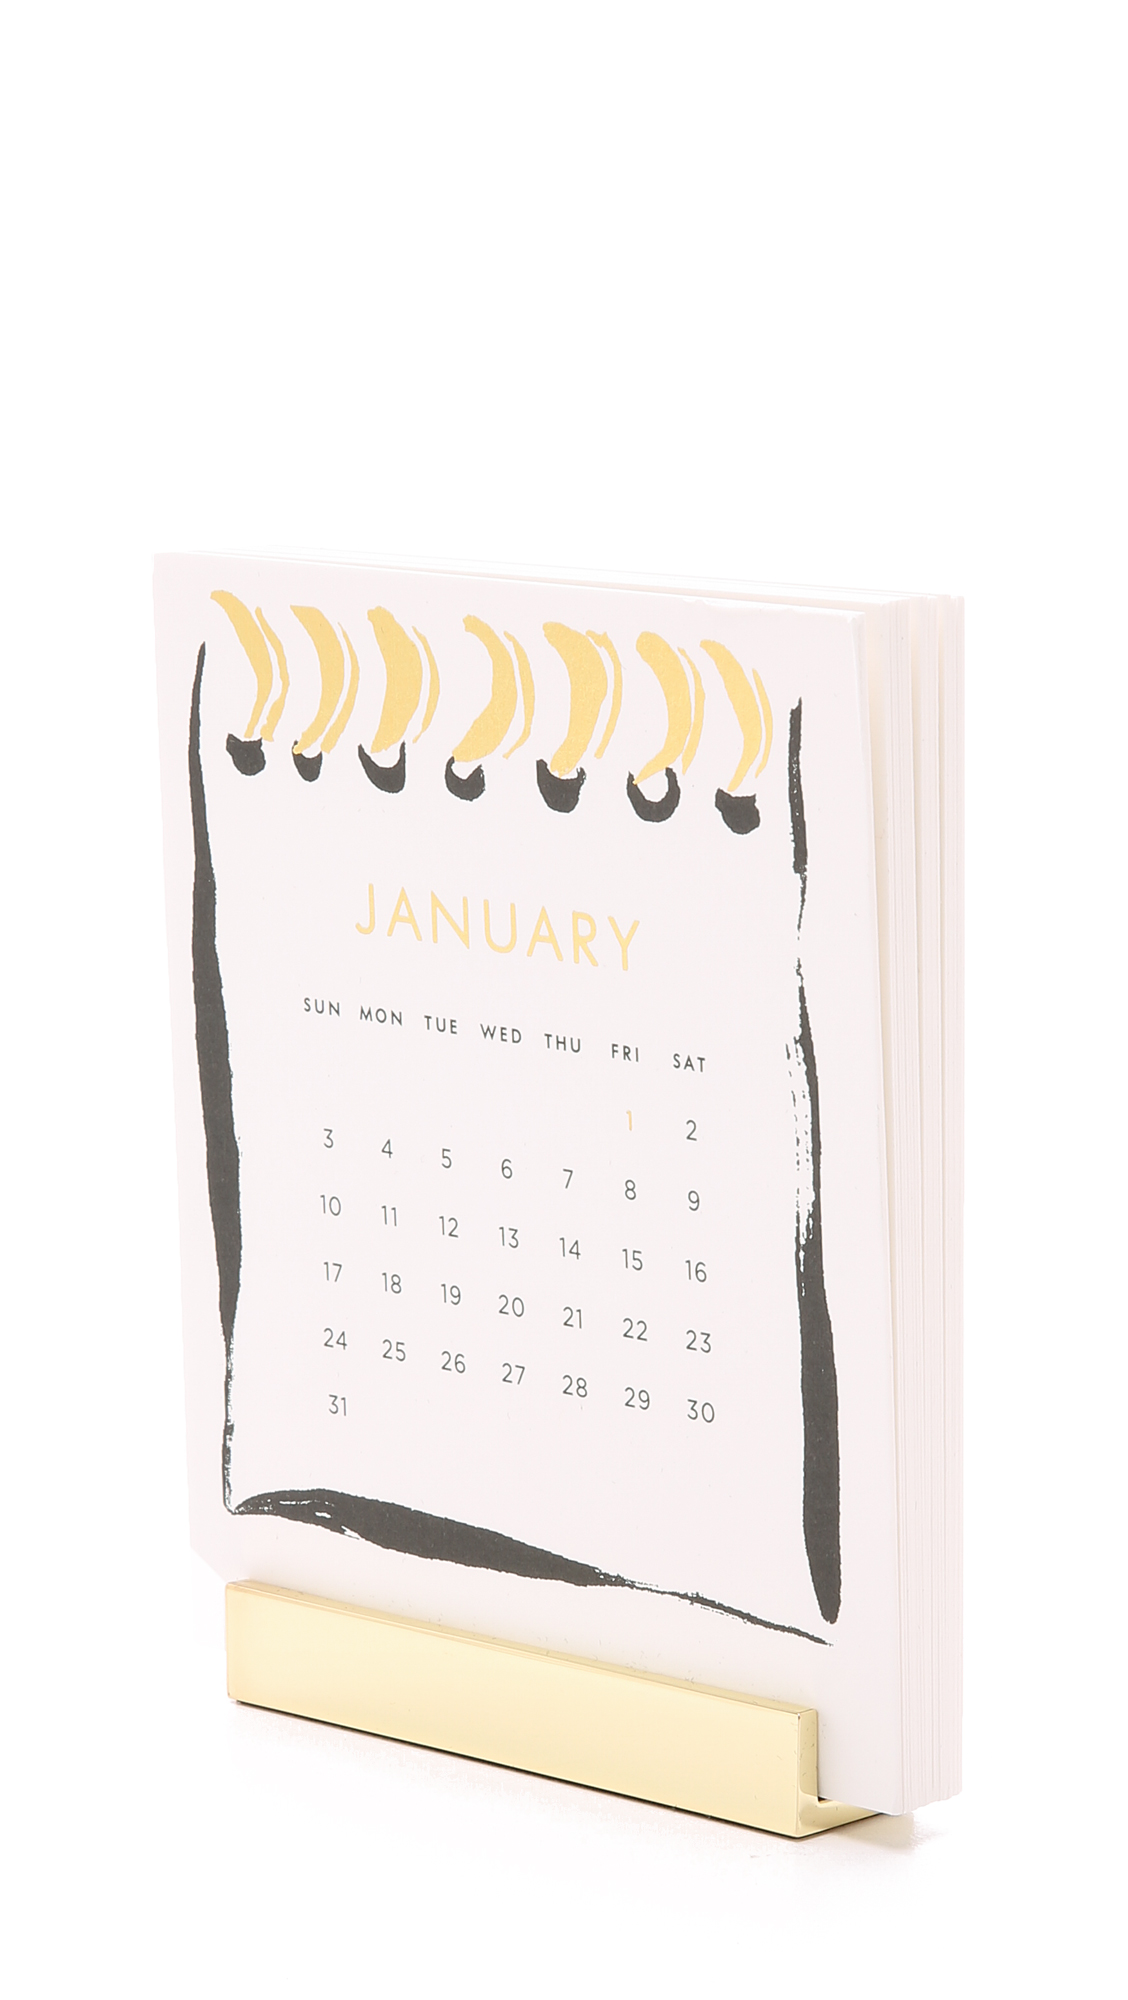 Attirant Kate Spade New York Desktop Calendar | SHOPBOP